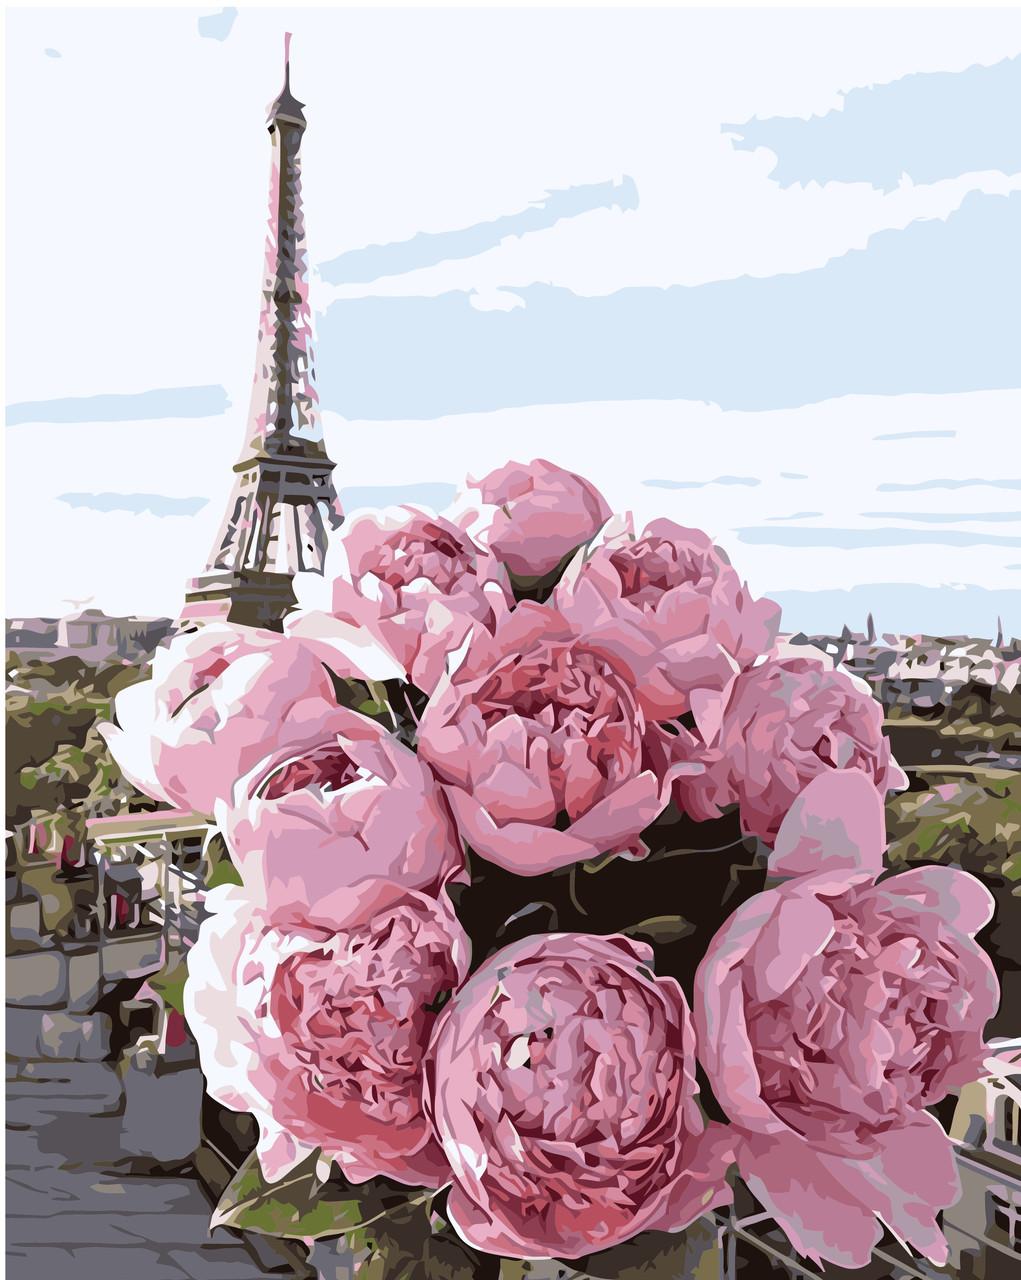 Картина по номерам VA-1204 Пионы на фоне Парижа, 40х50см. Strateg